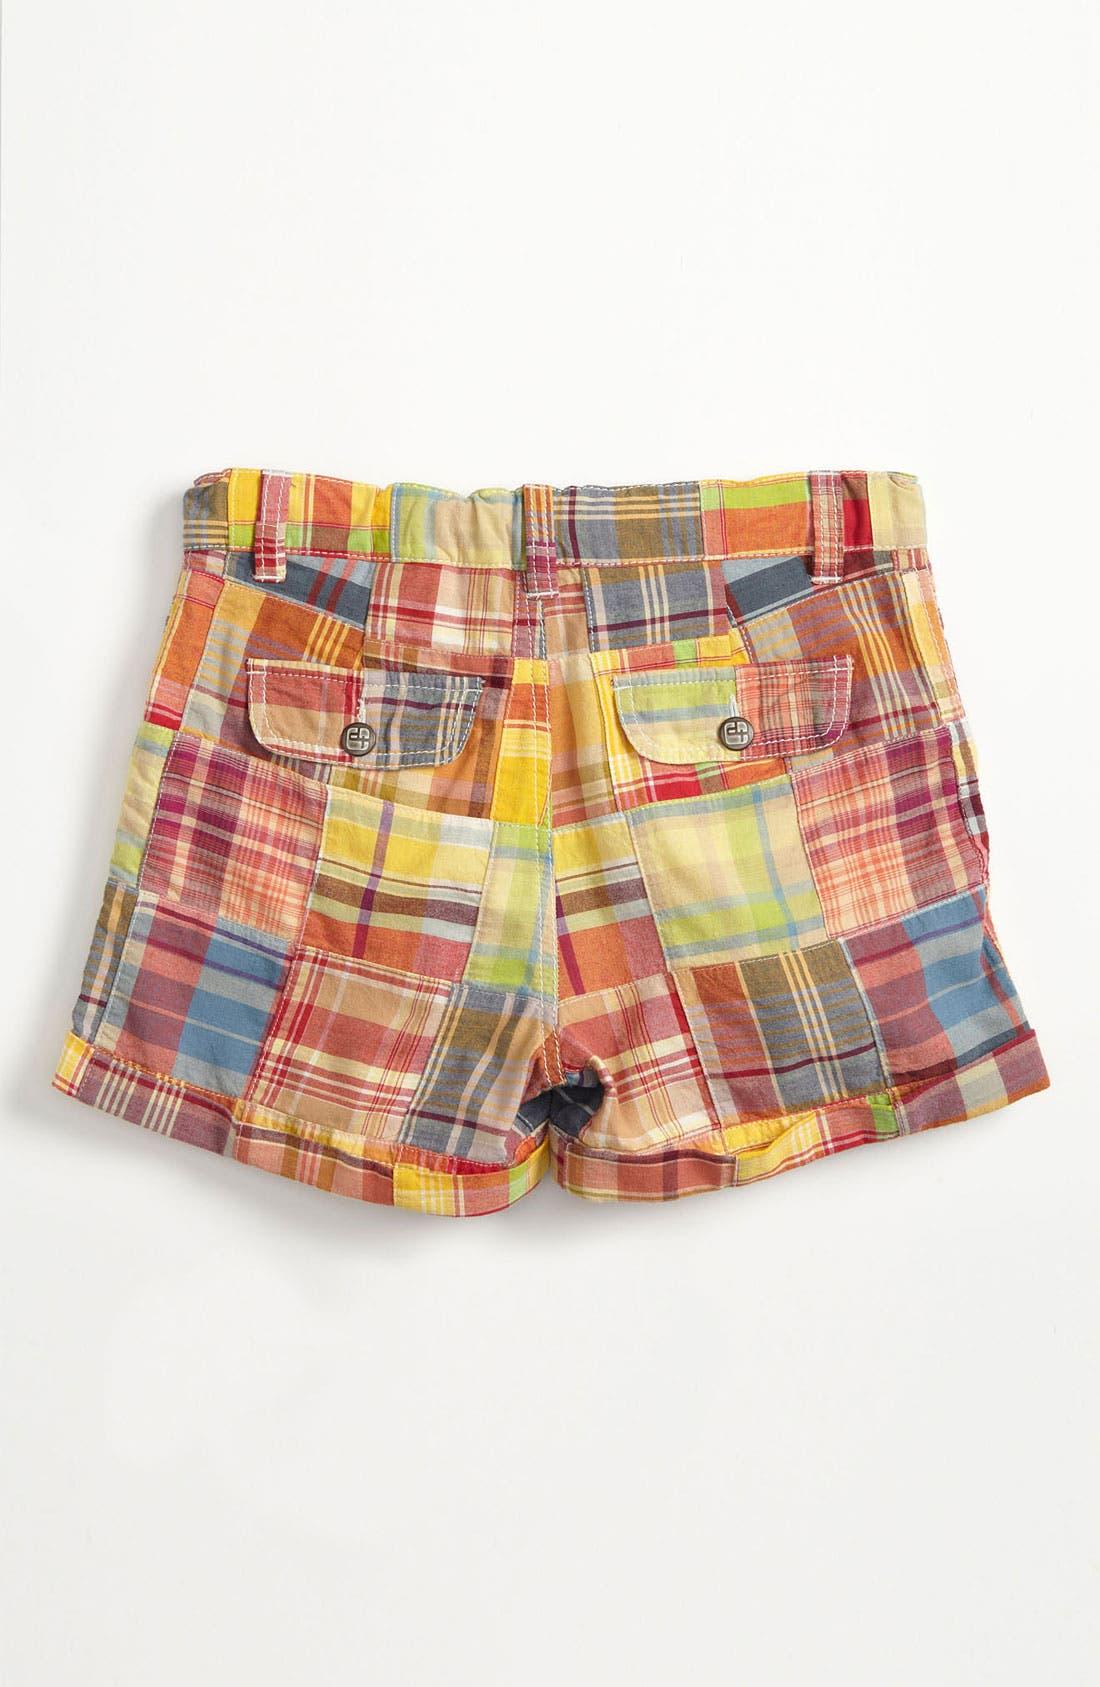 Main Image - Tucker + Tate 'Clover' Patchwork Shorts (Big Girls)